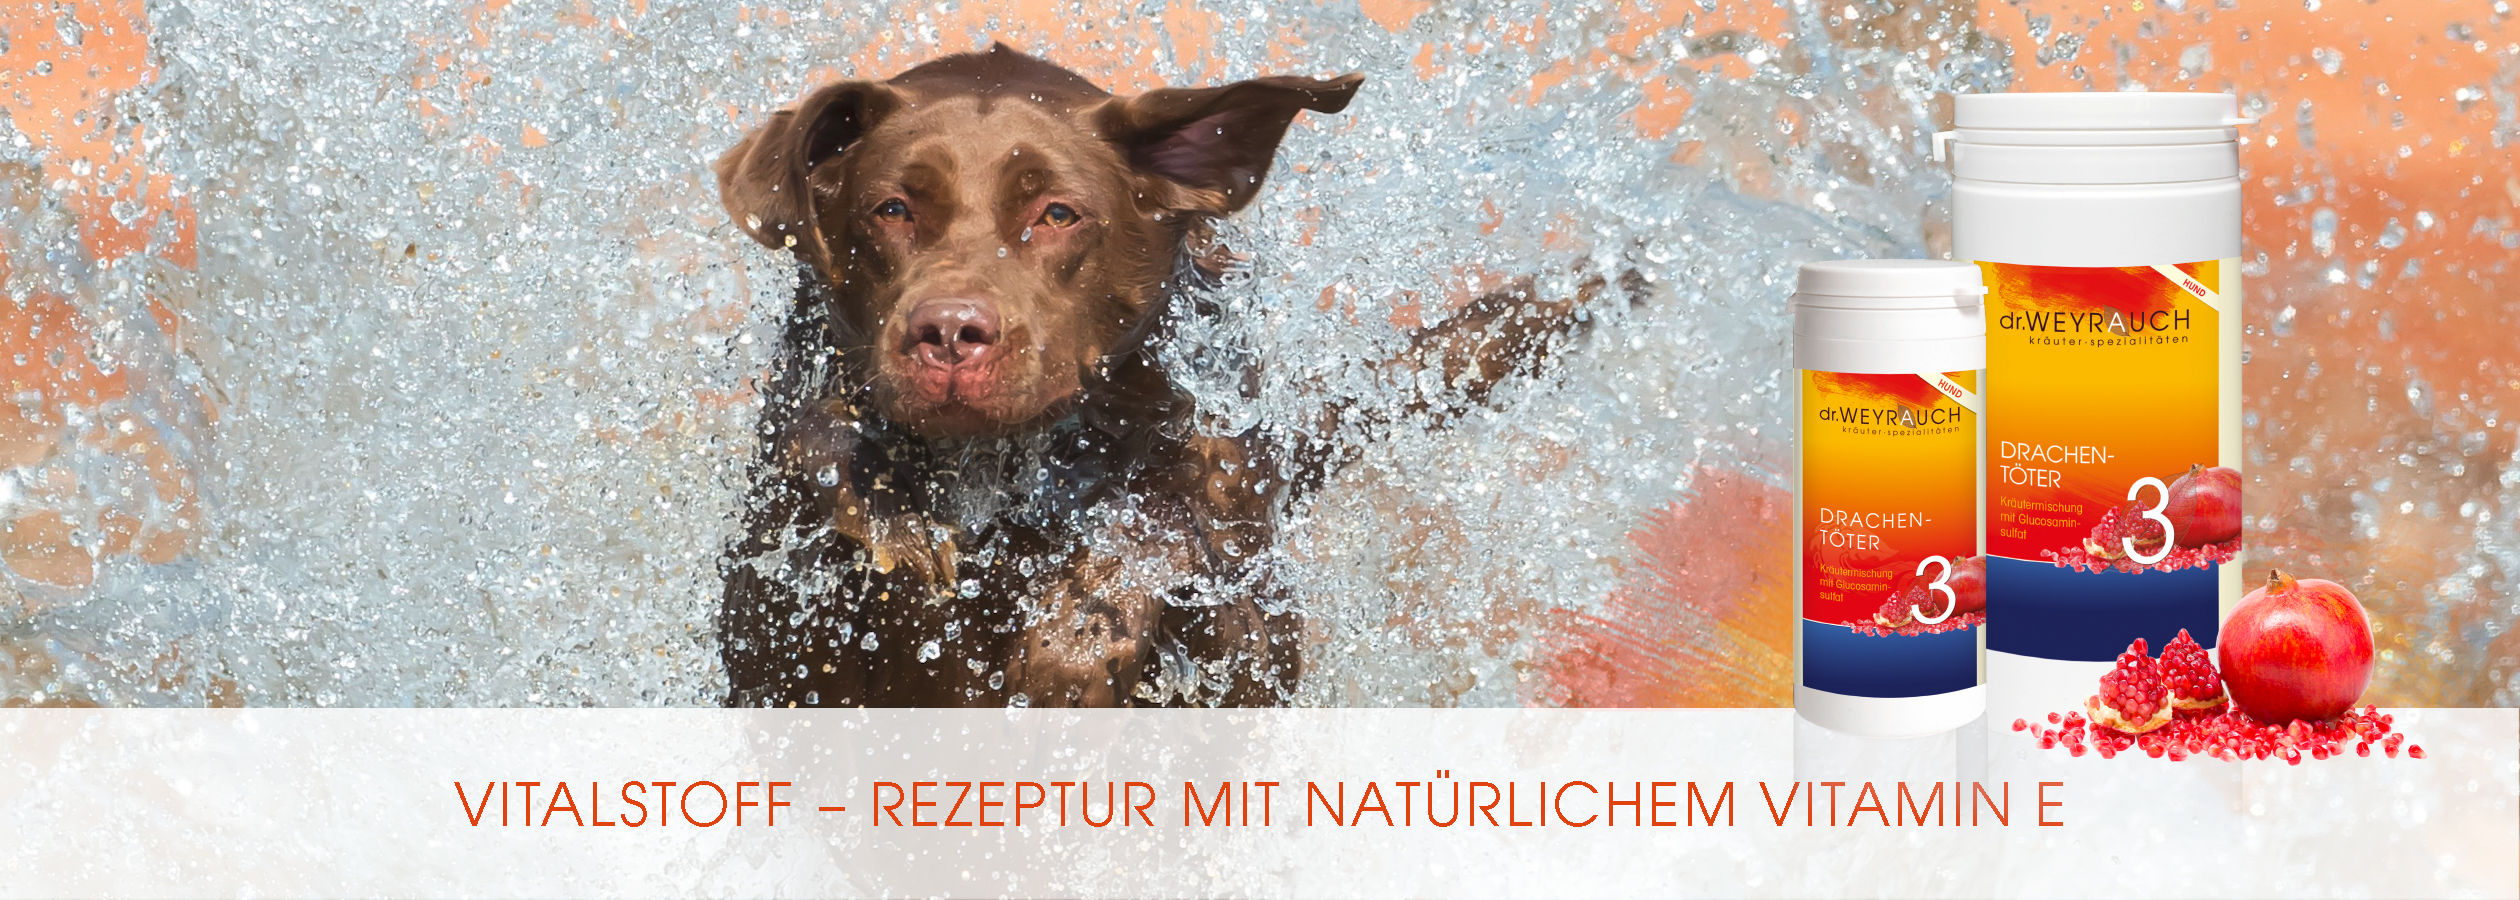 HEADER-2017-Drachent-ter-Hund